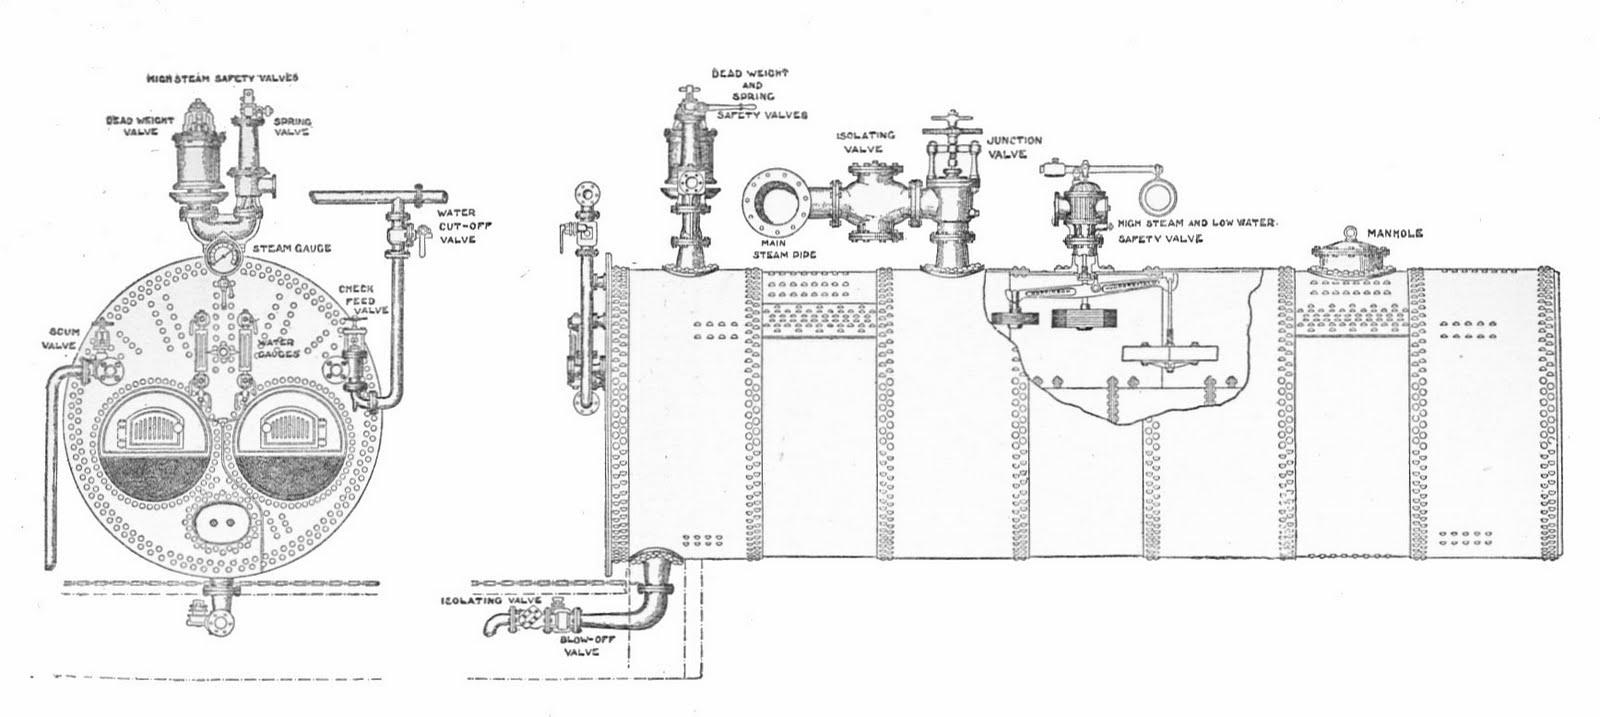 MECHANICAL DAE: Lancashire Boiler